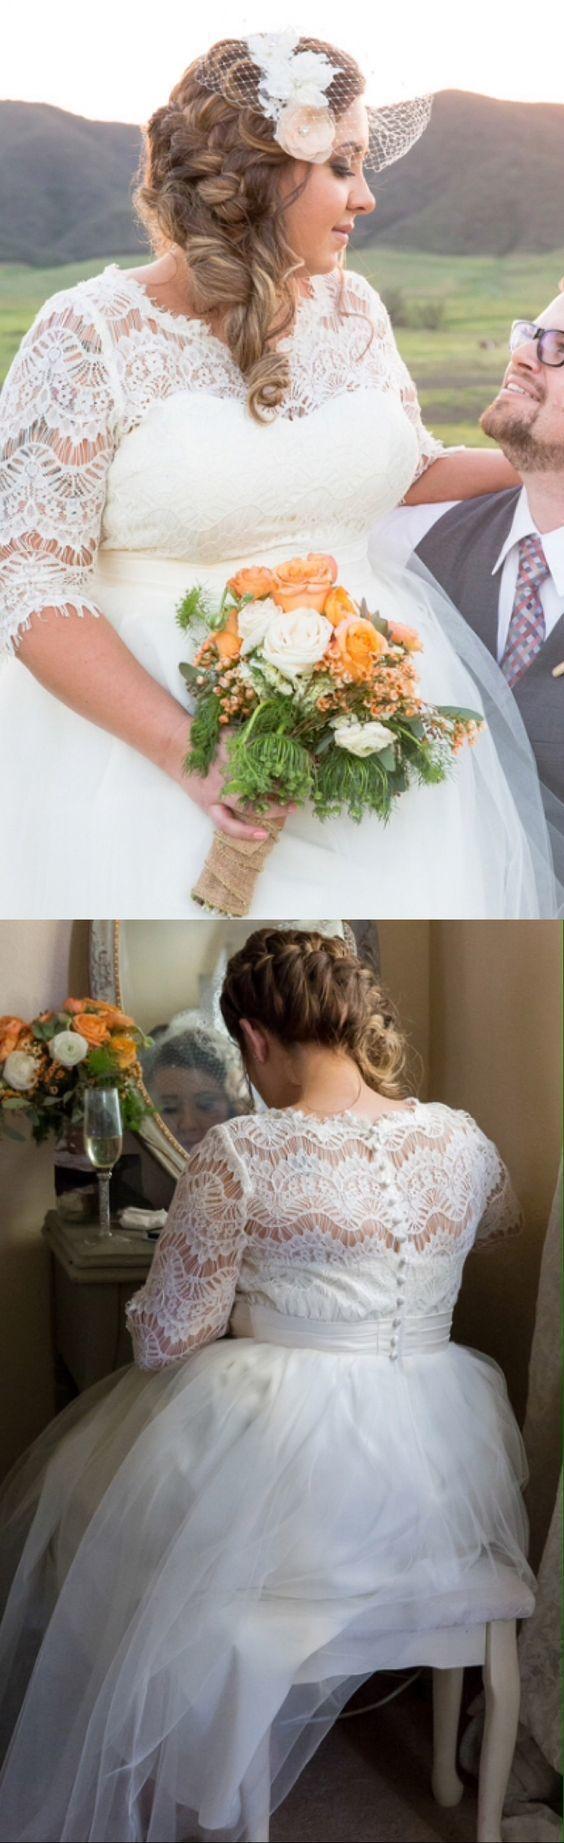 Elegant Long Half Sleeves Lace Wedding Dresses Plus Size